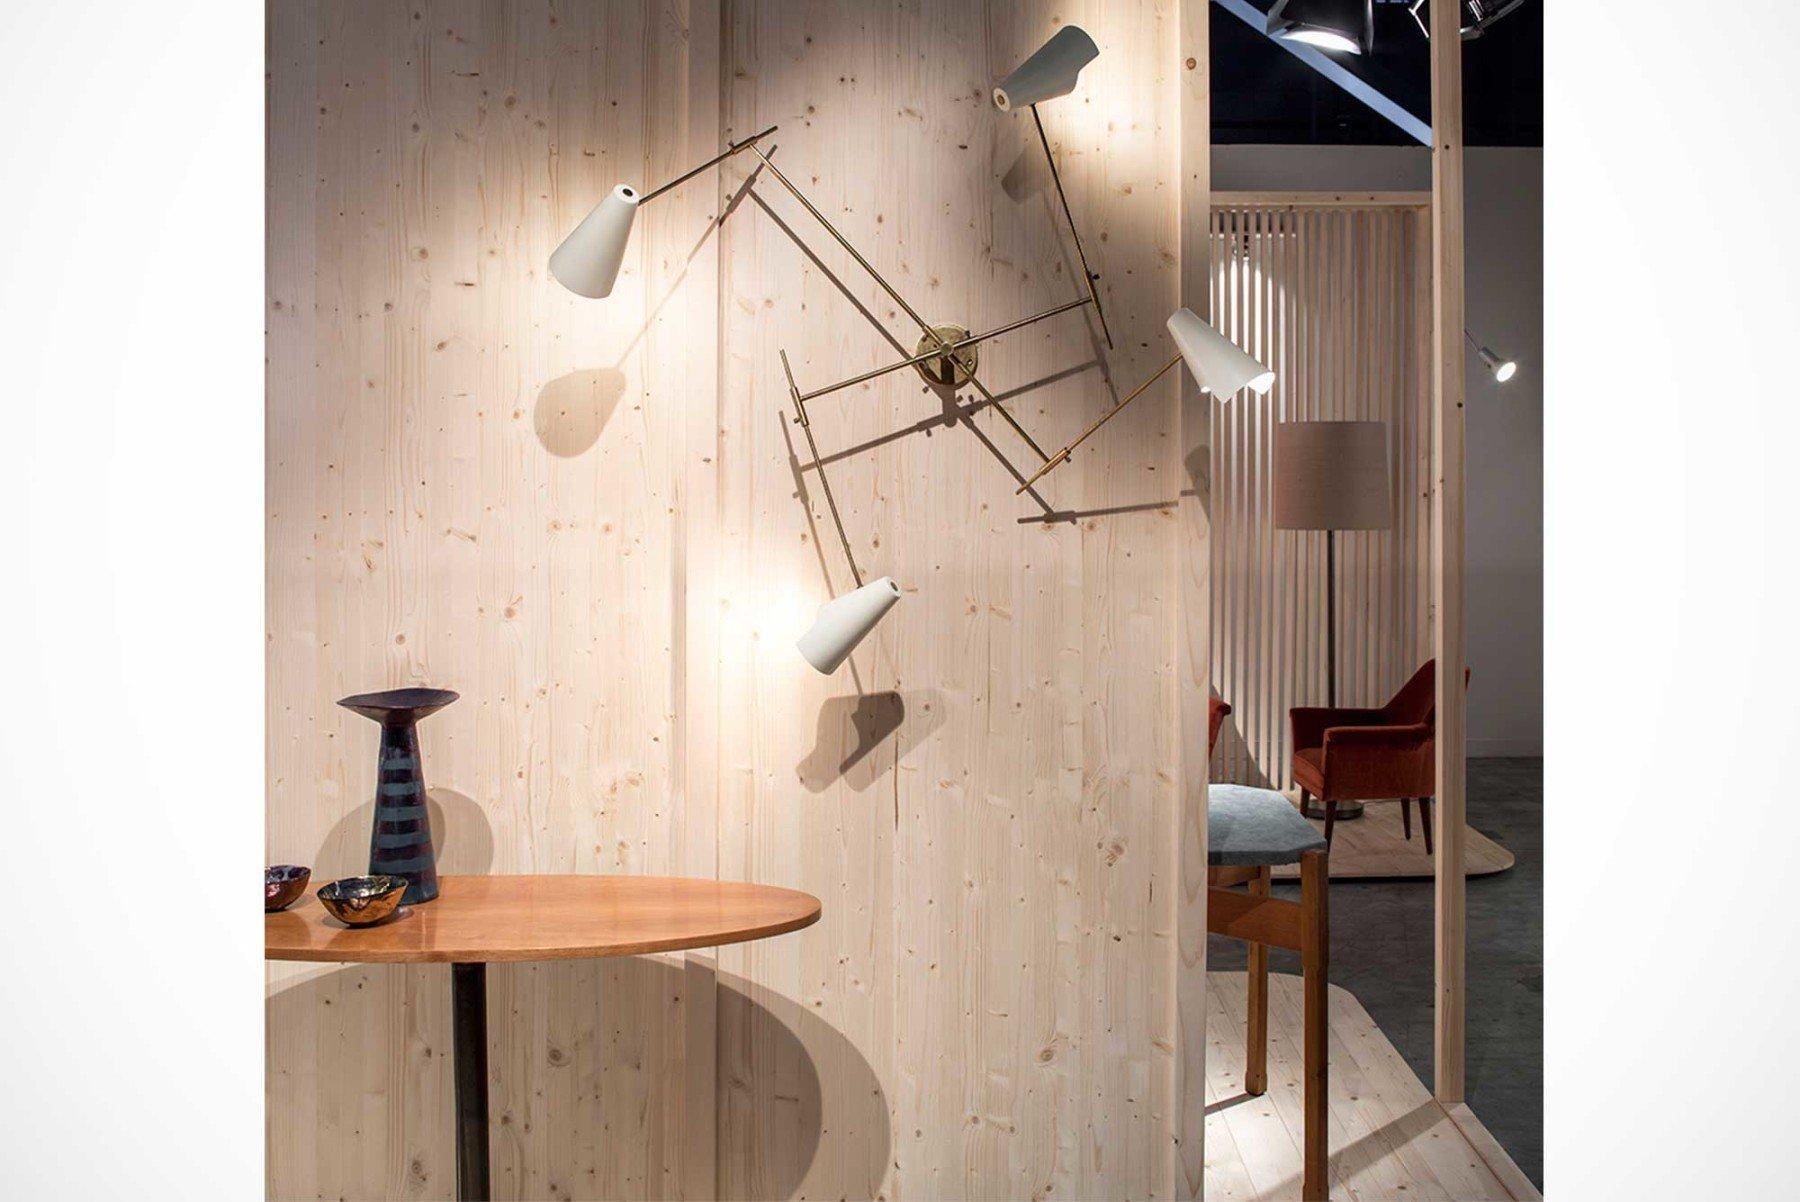 Gino Sarfatti |   Rare wall light, model 169/4